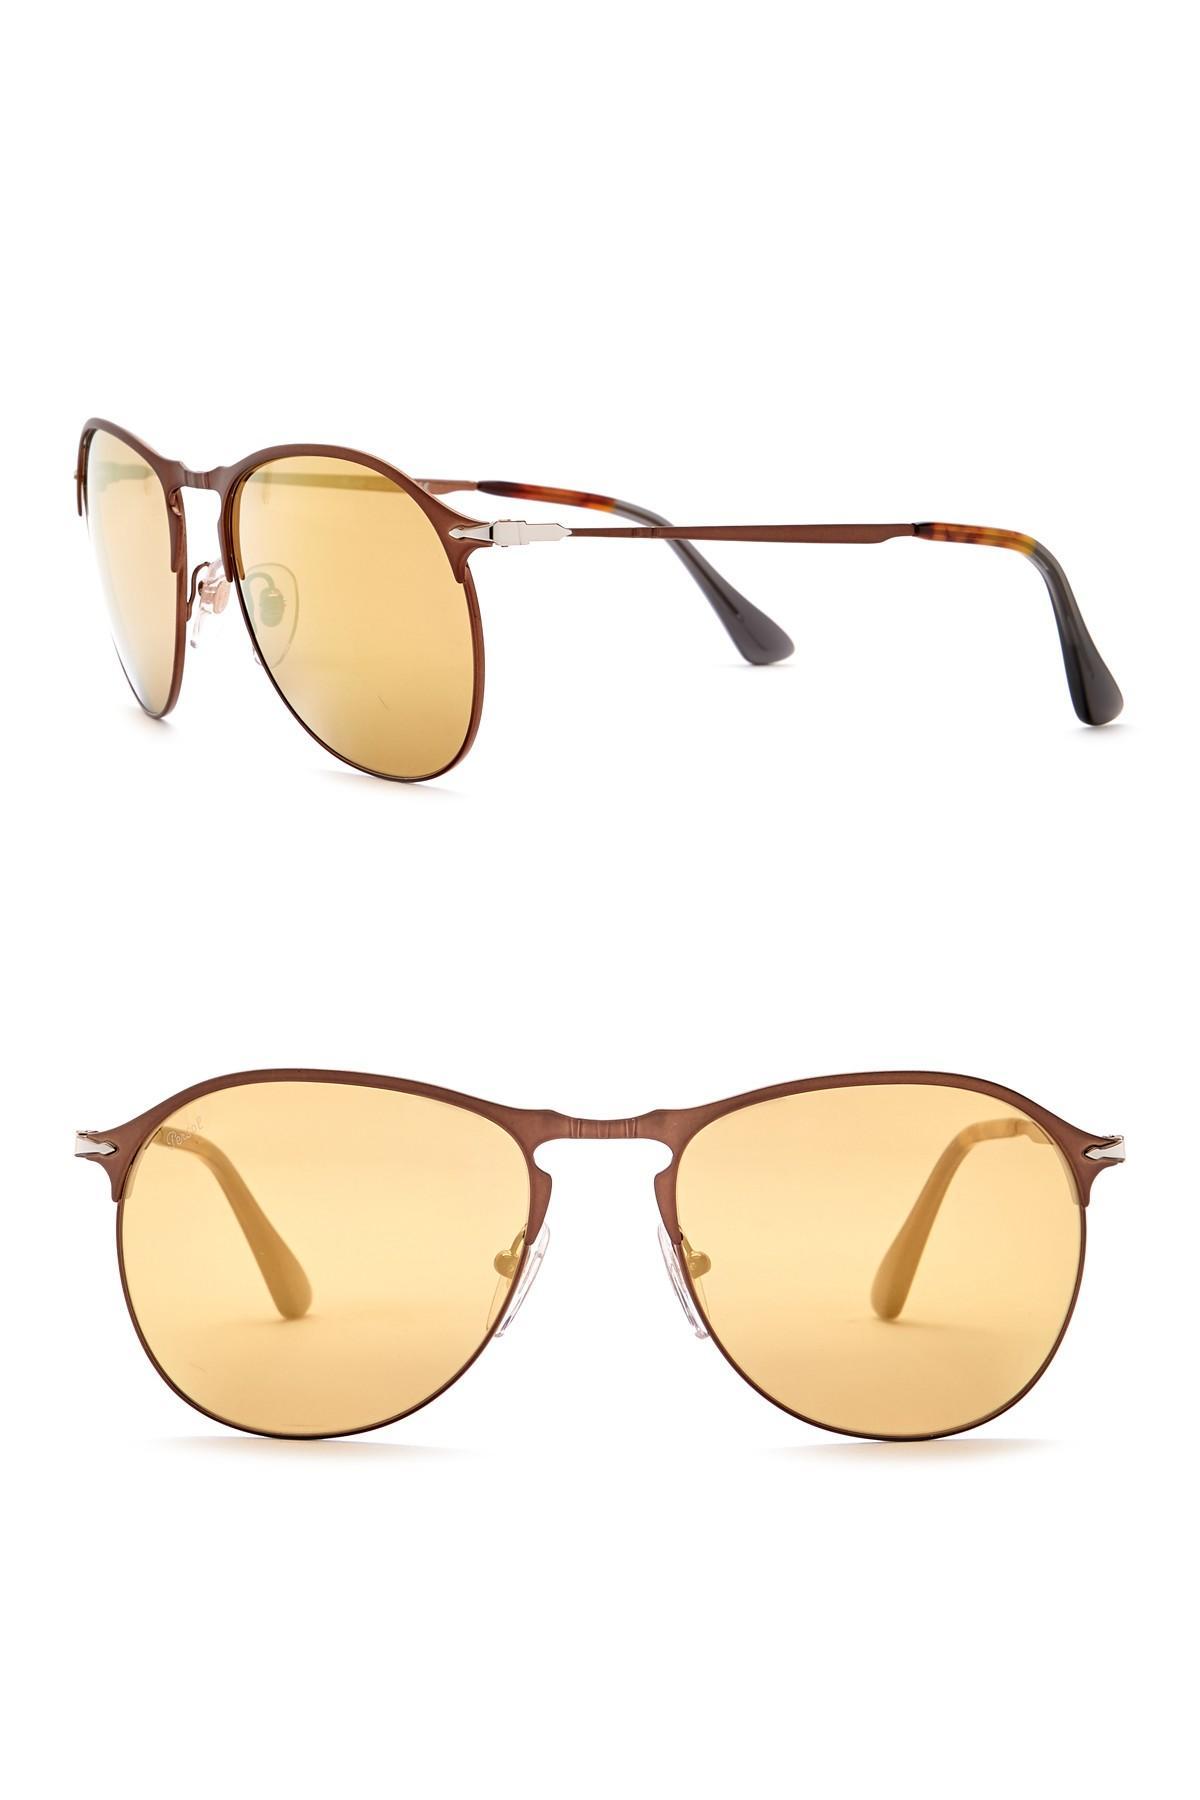 e093b3b8c7 Lyst - Persol 56mm Sartoria Sunglasses for Men - Save 18%